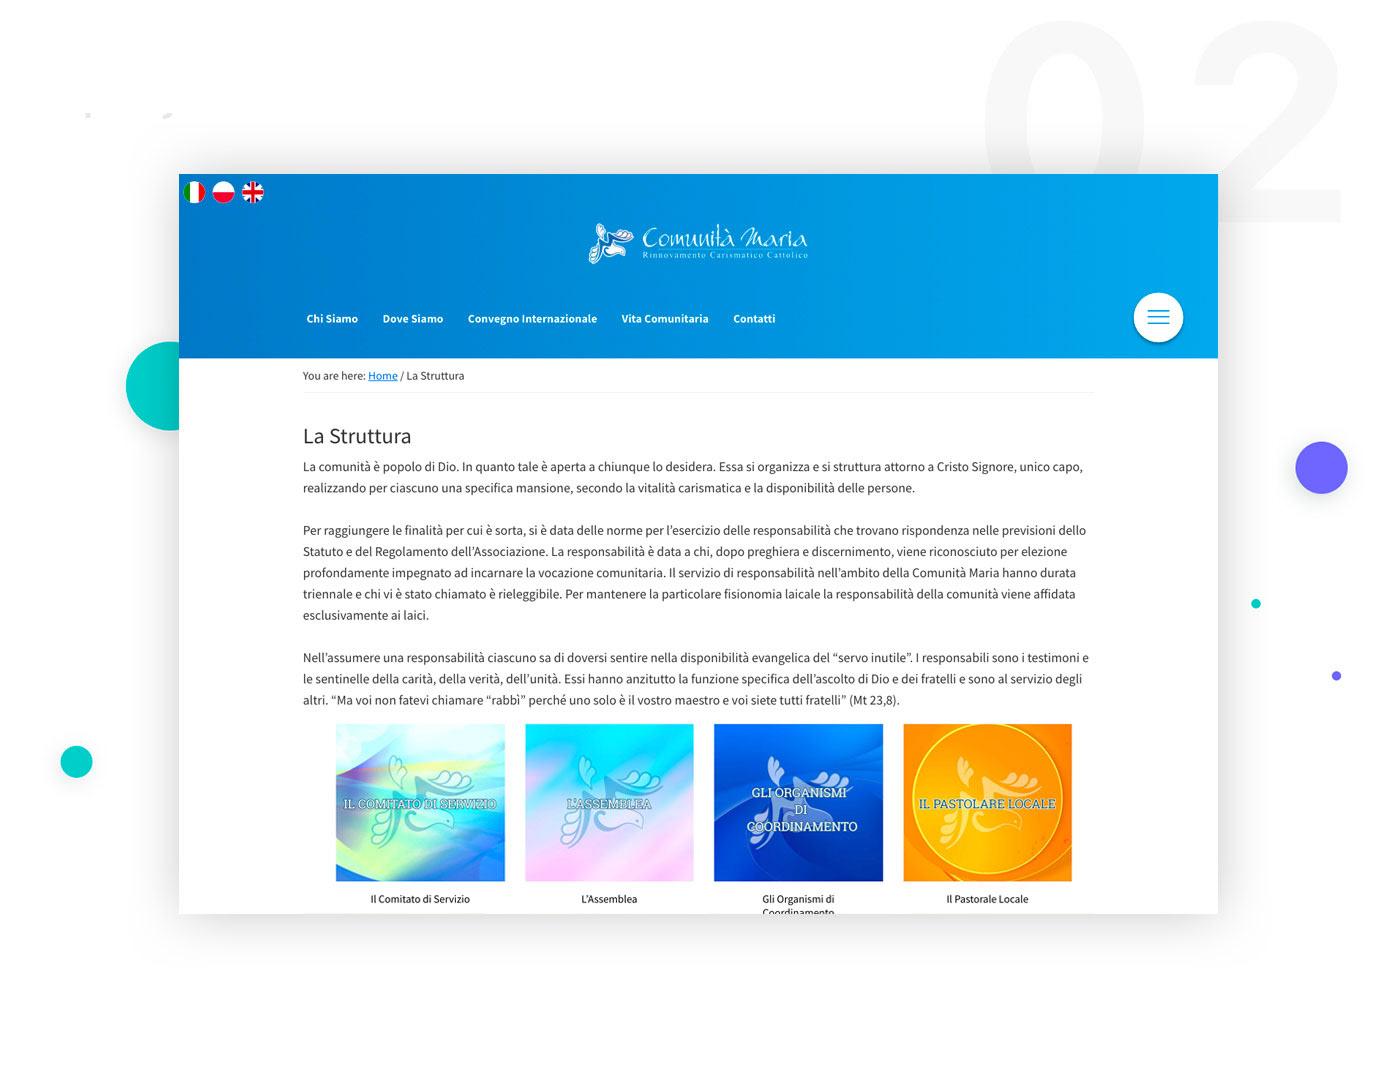 COMUNITà MARIA Web Design  web development  Rinnovamento Carismatico Cattolico UIX wordpress Woocommerce payments booking online https